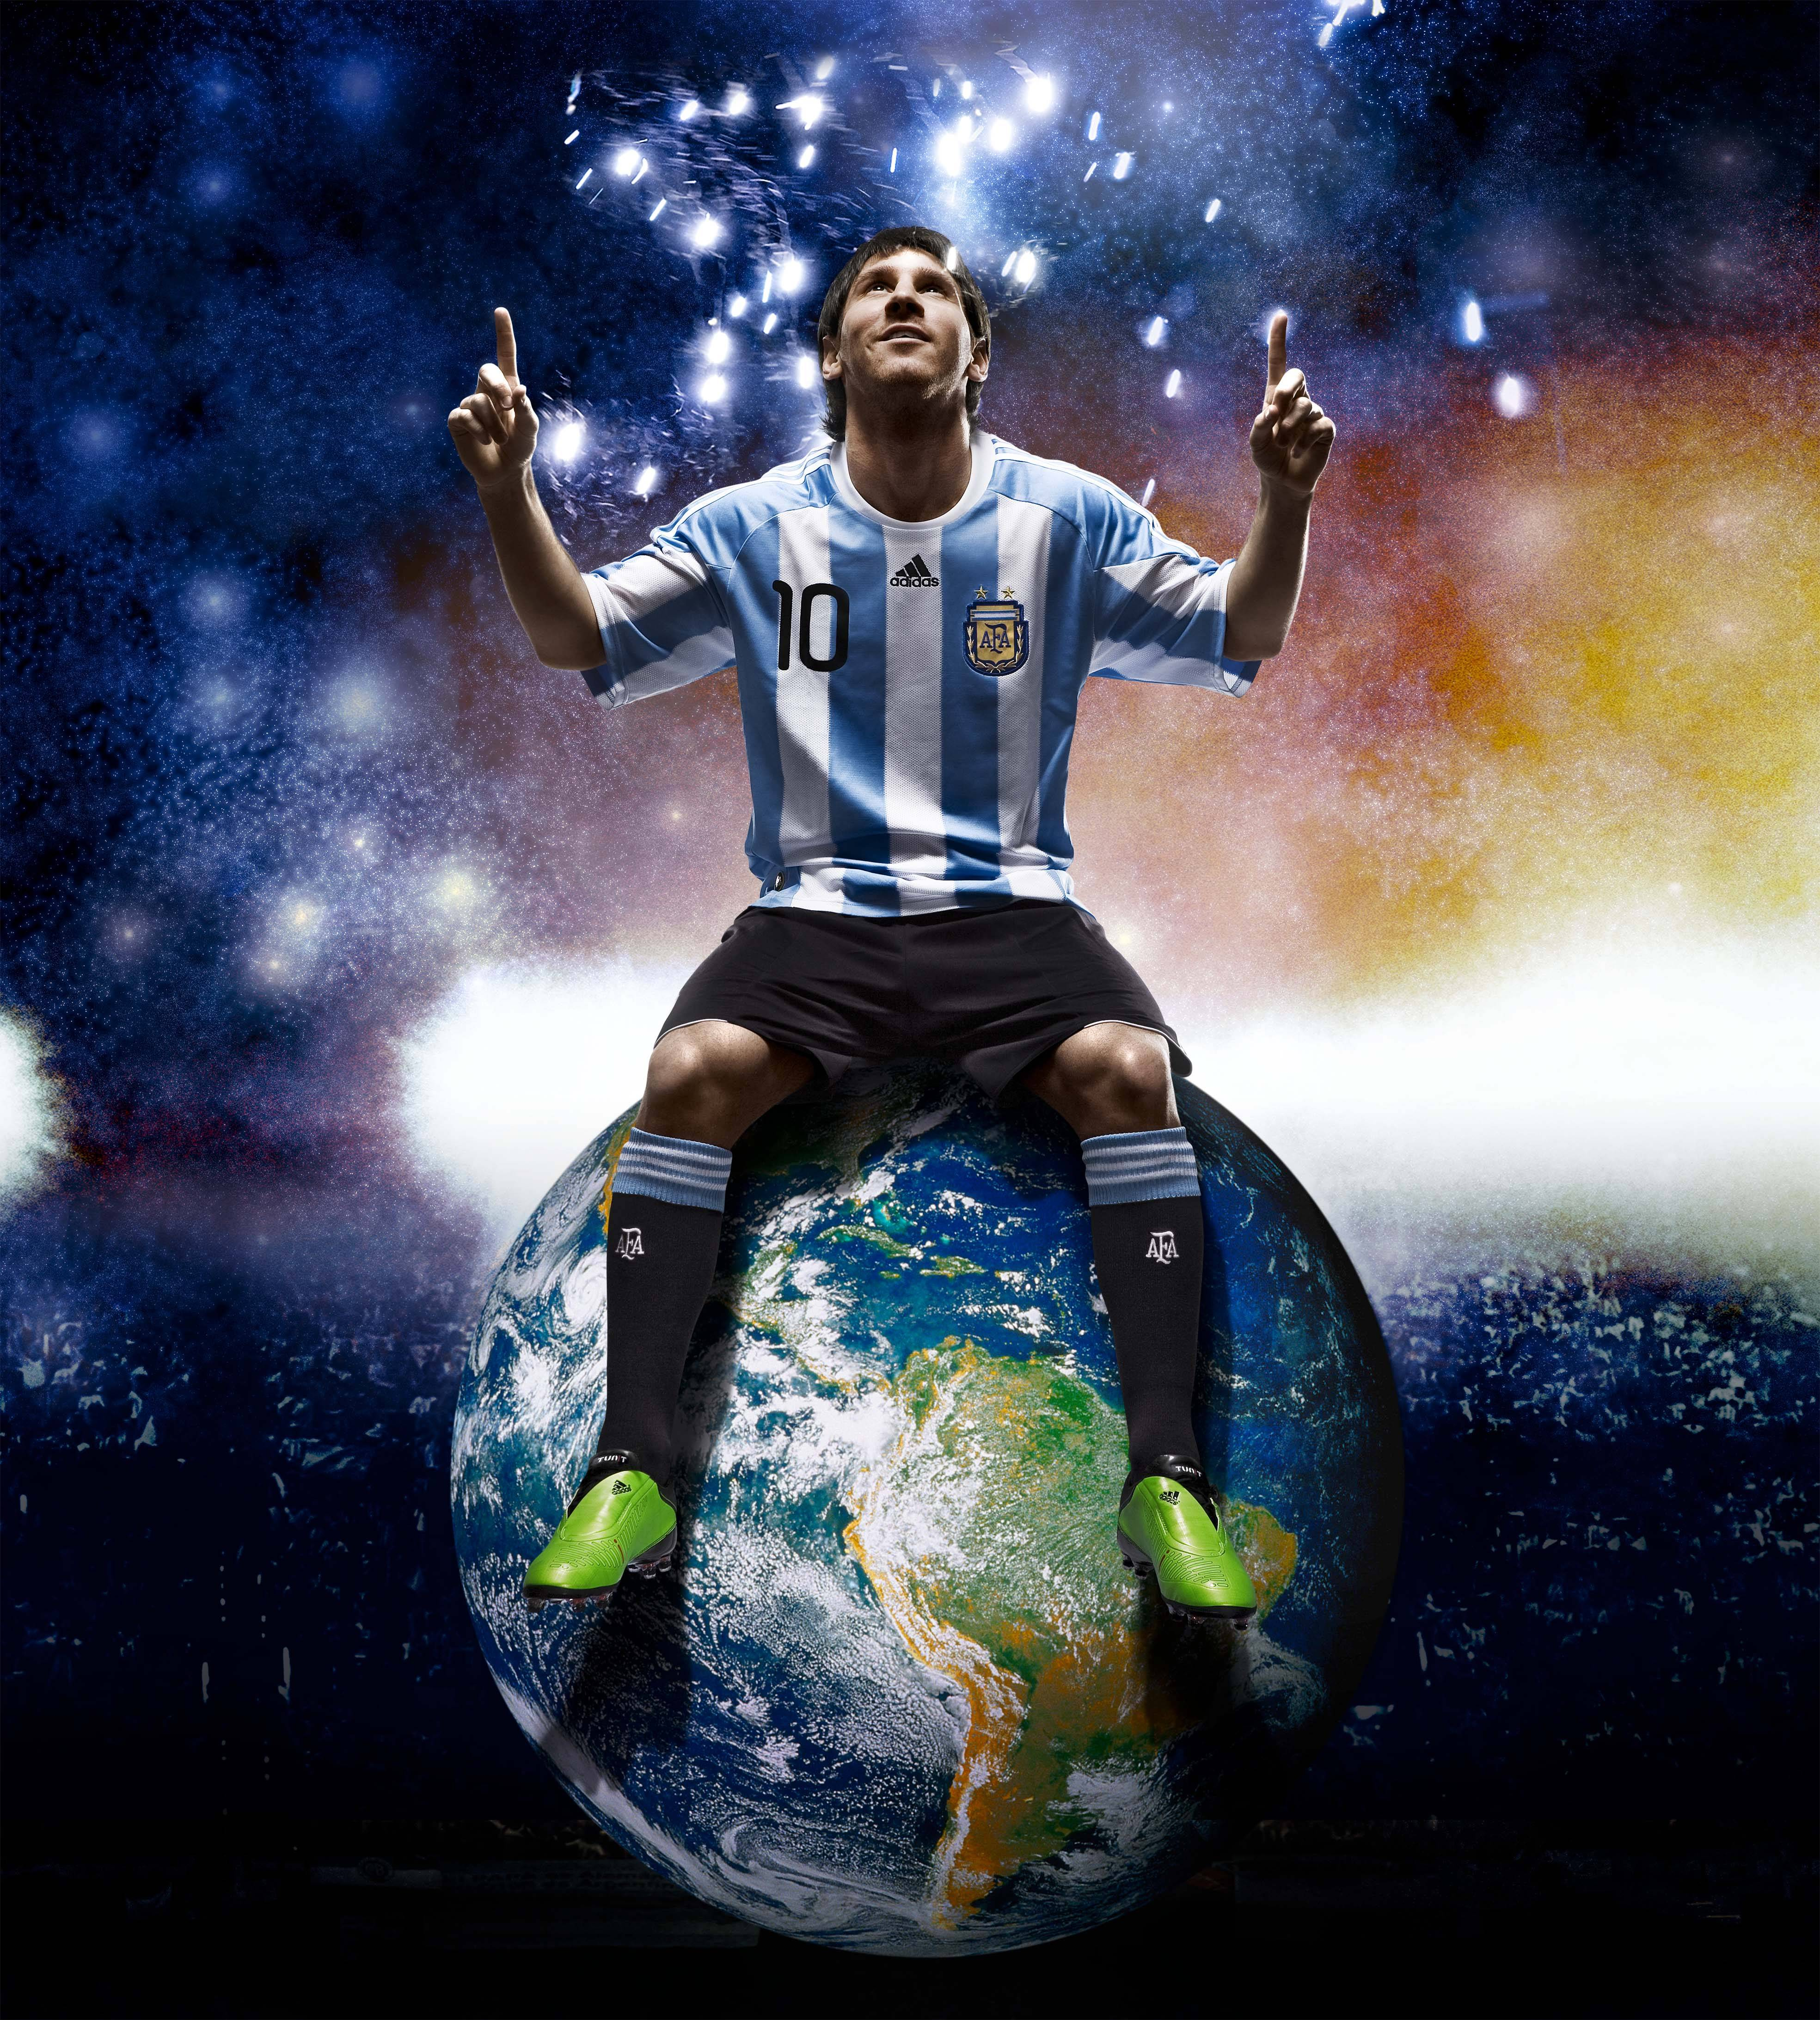 Messi Wallpapers 2017 >> Messi HD Wallpapers 1080p 2017 - Wallpaper Cave